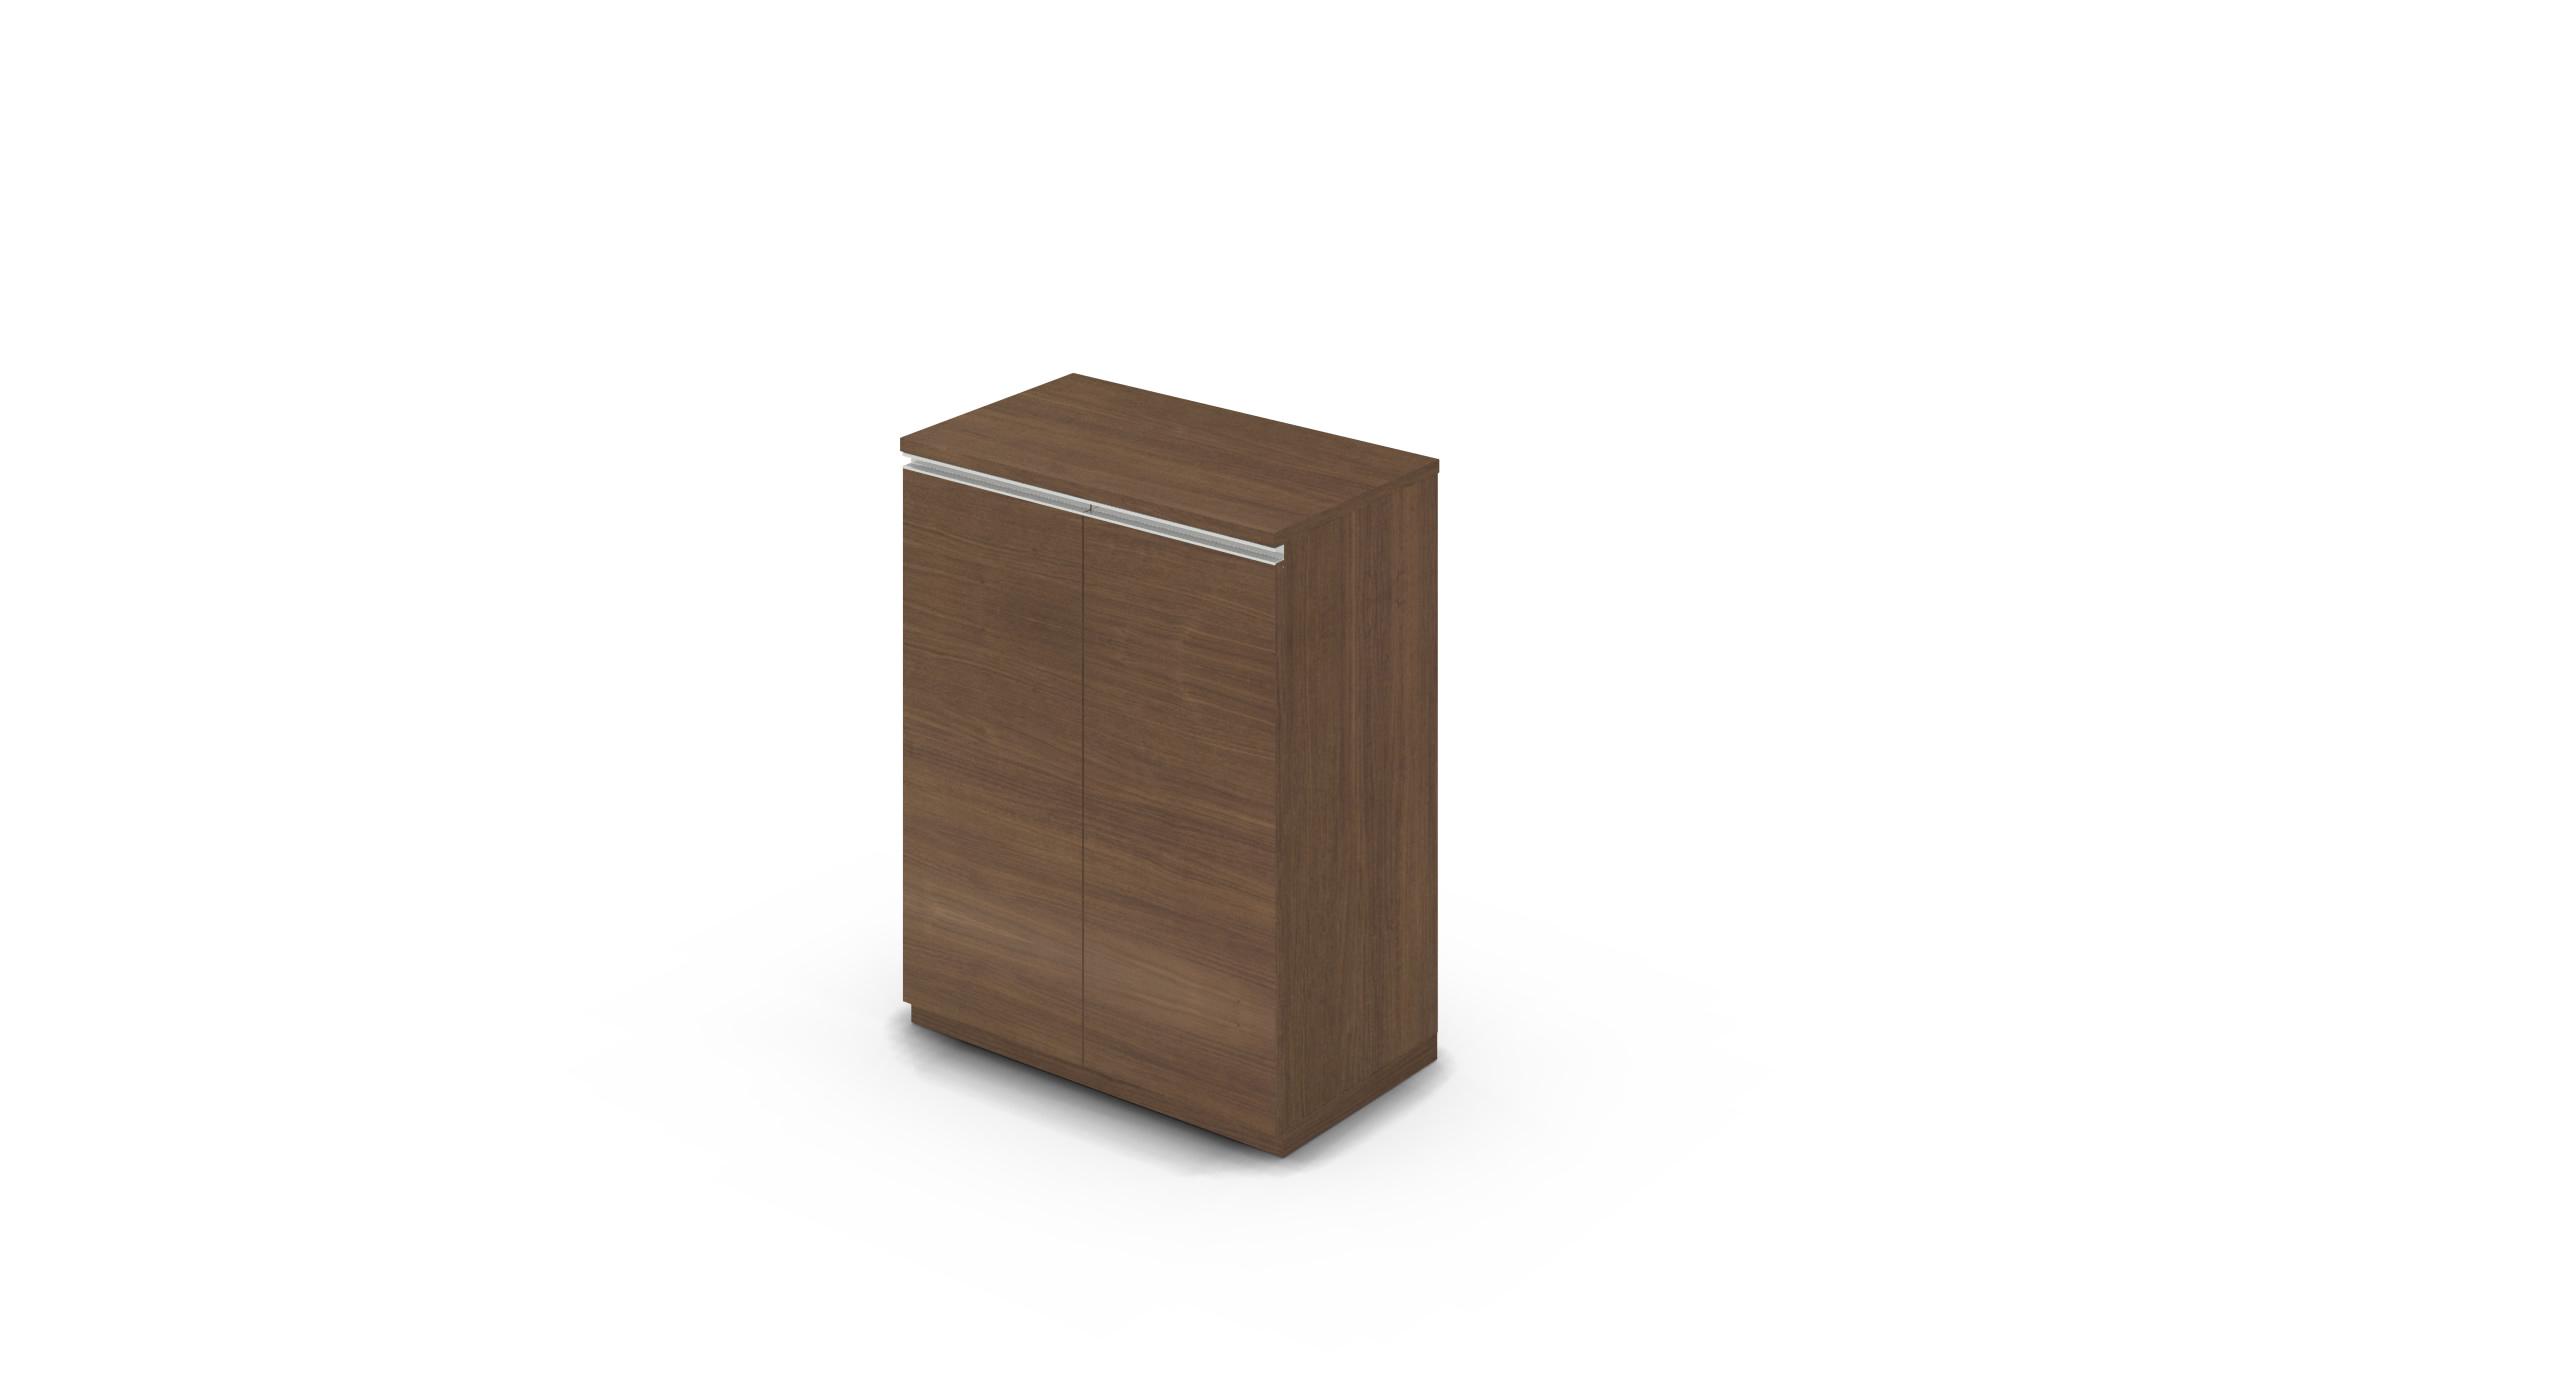 Cabinet_800x450x1125_HD_Walnut_Rail_NoCylinder